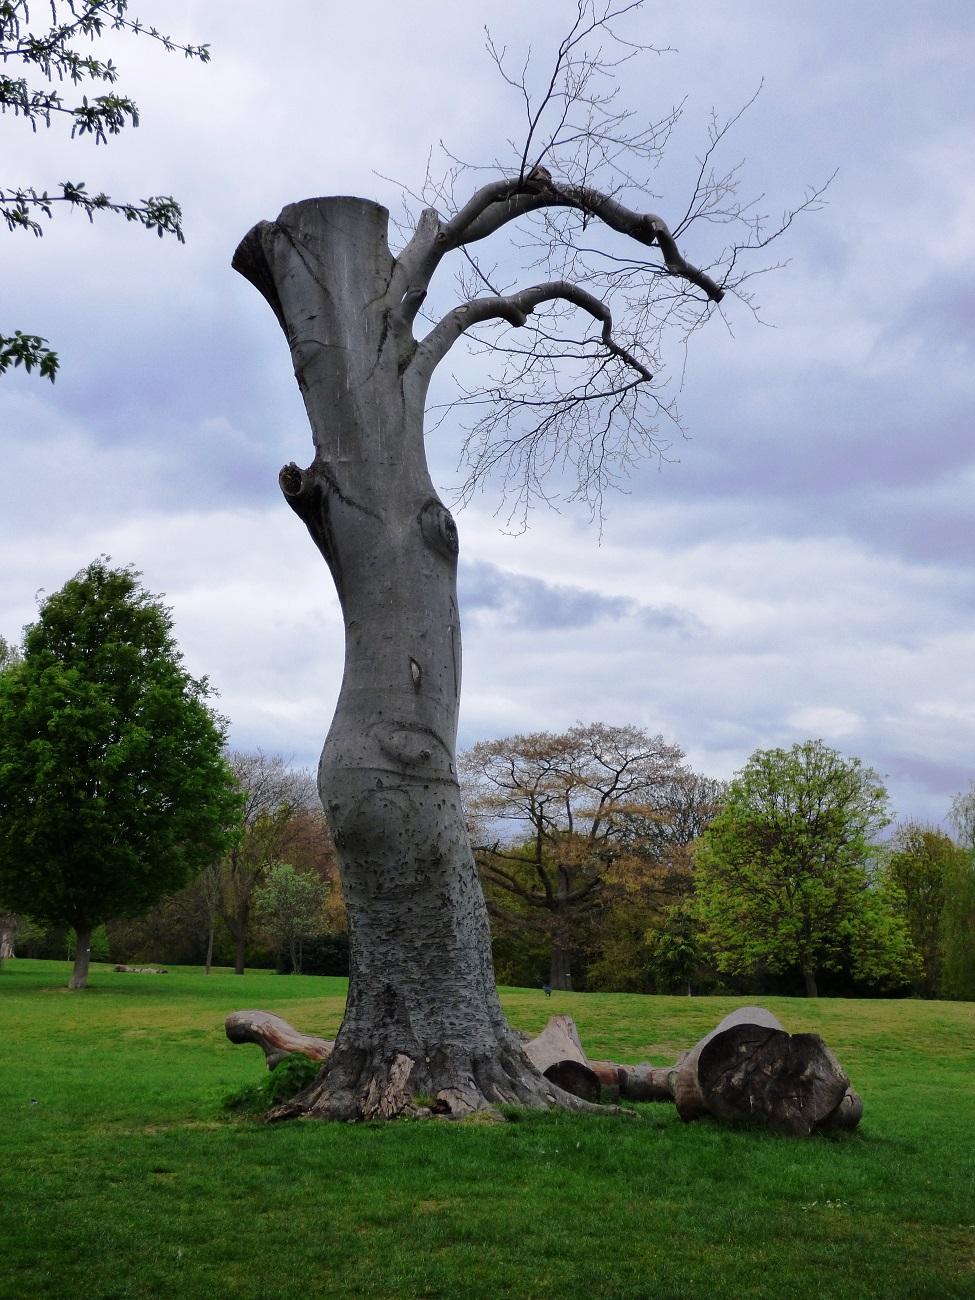 20170414_Hackney_Springfield-Park_Chopped-Tree-in-Springfield-Park